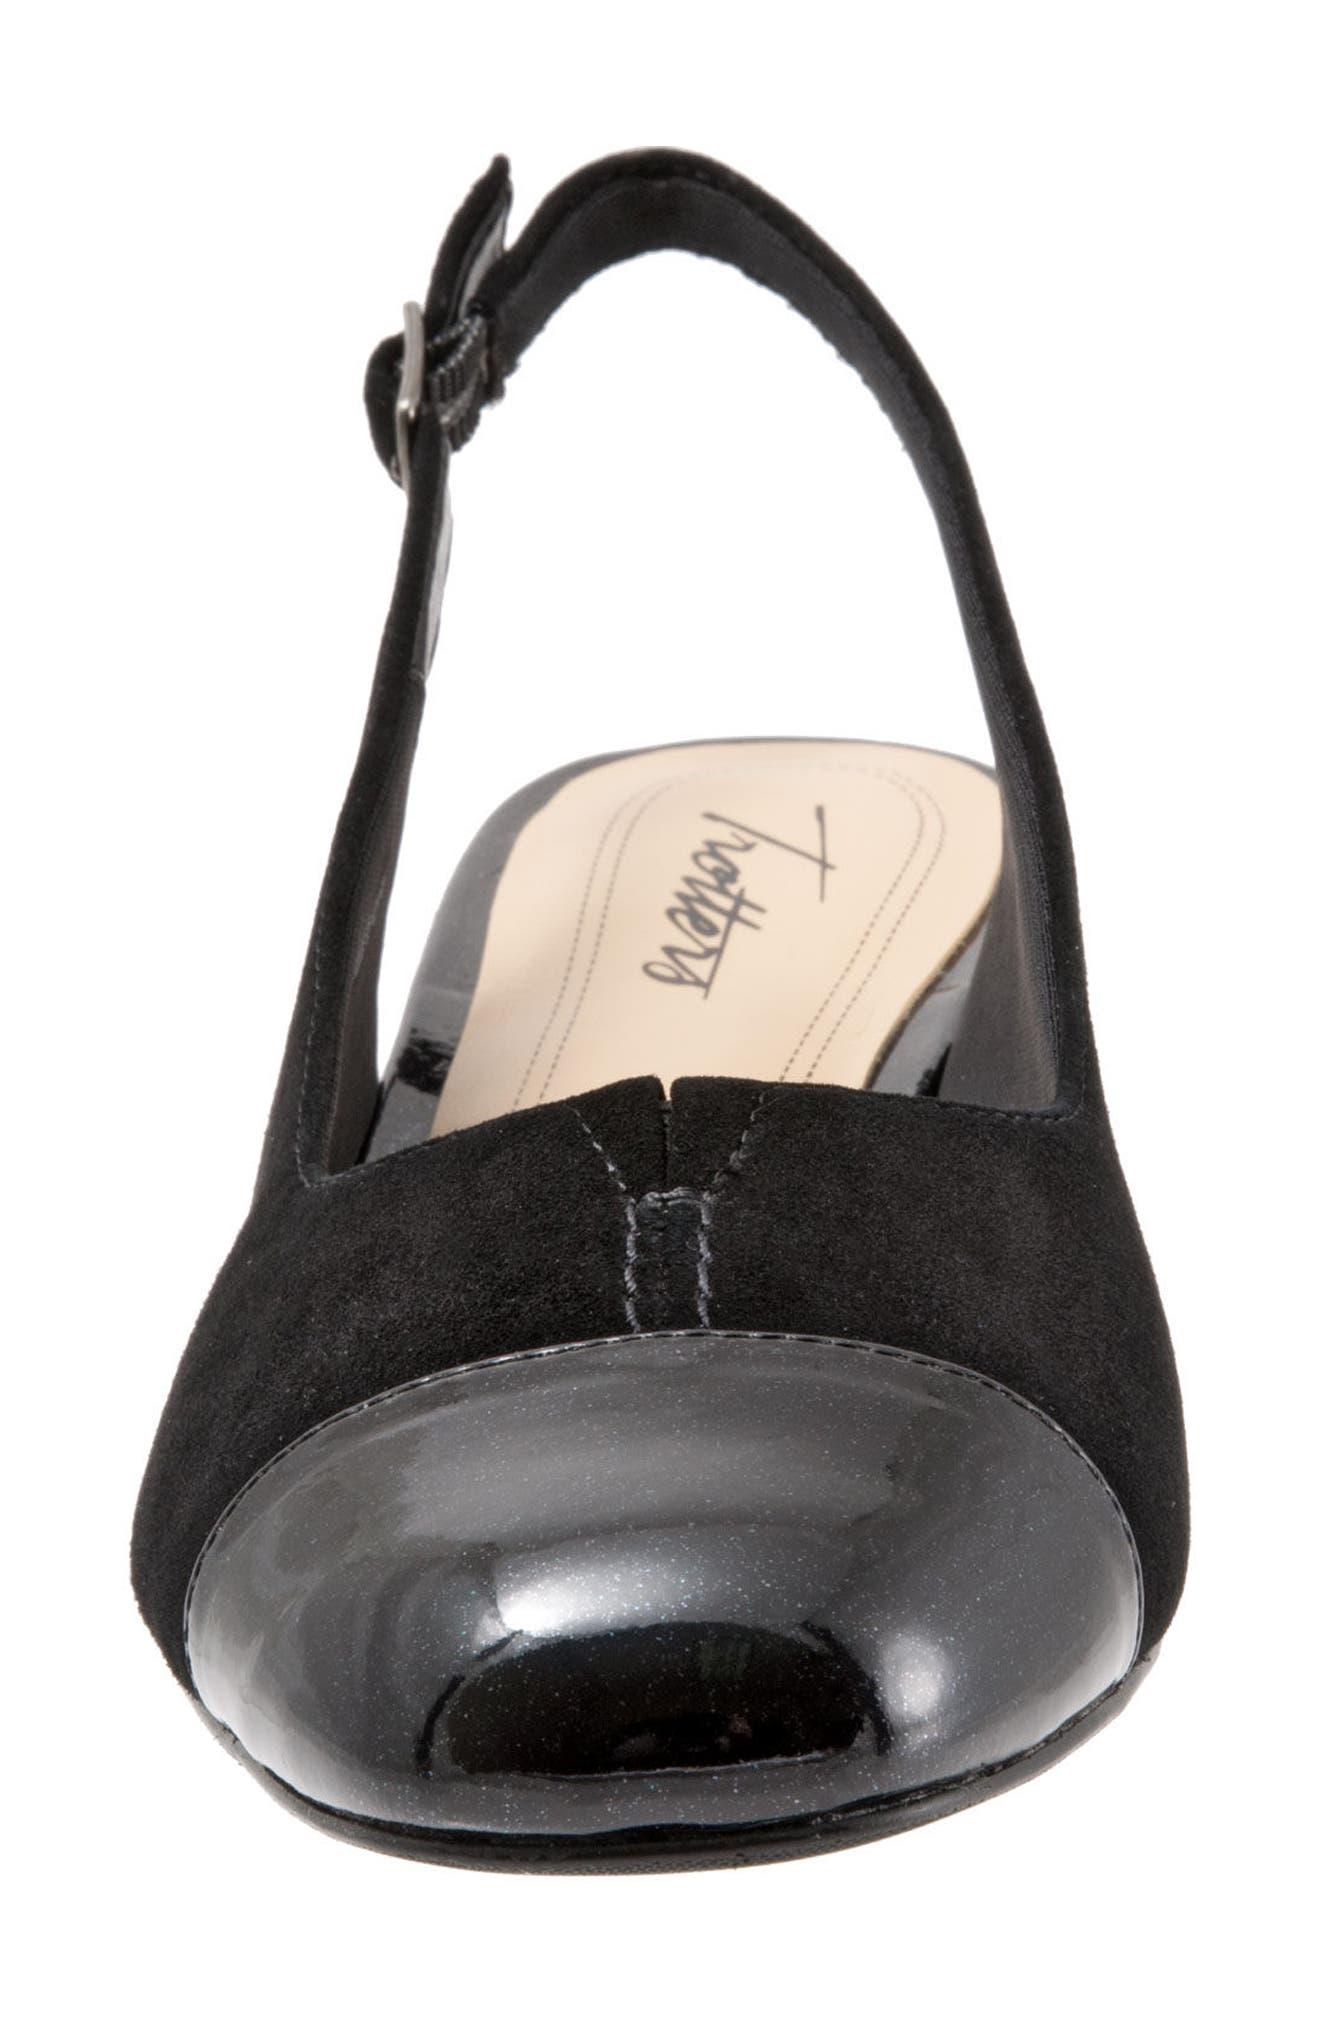 'Dea' Slingback,                             Alternate thumbnail 4, color,                             Black Leather